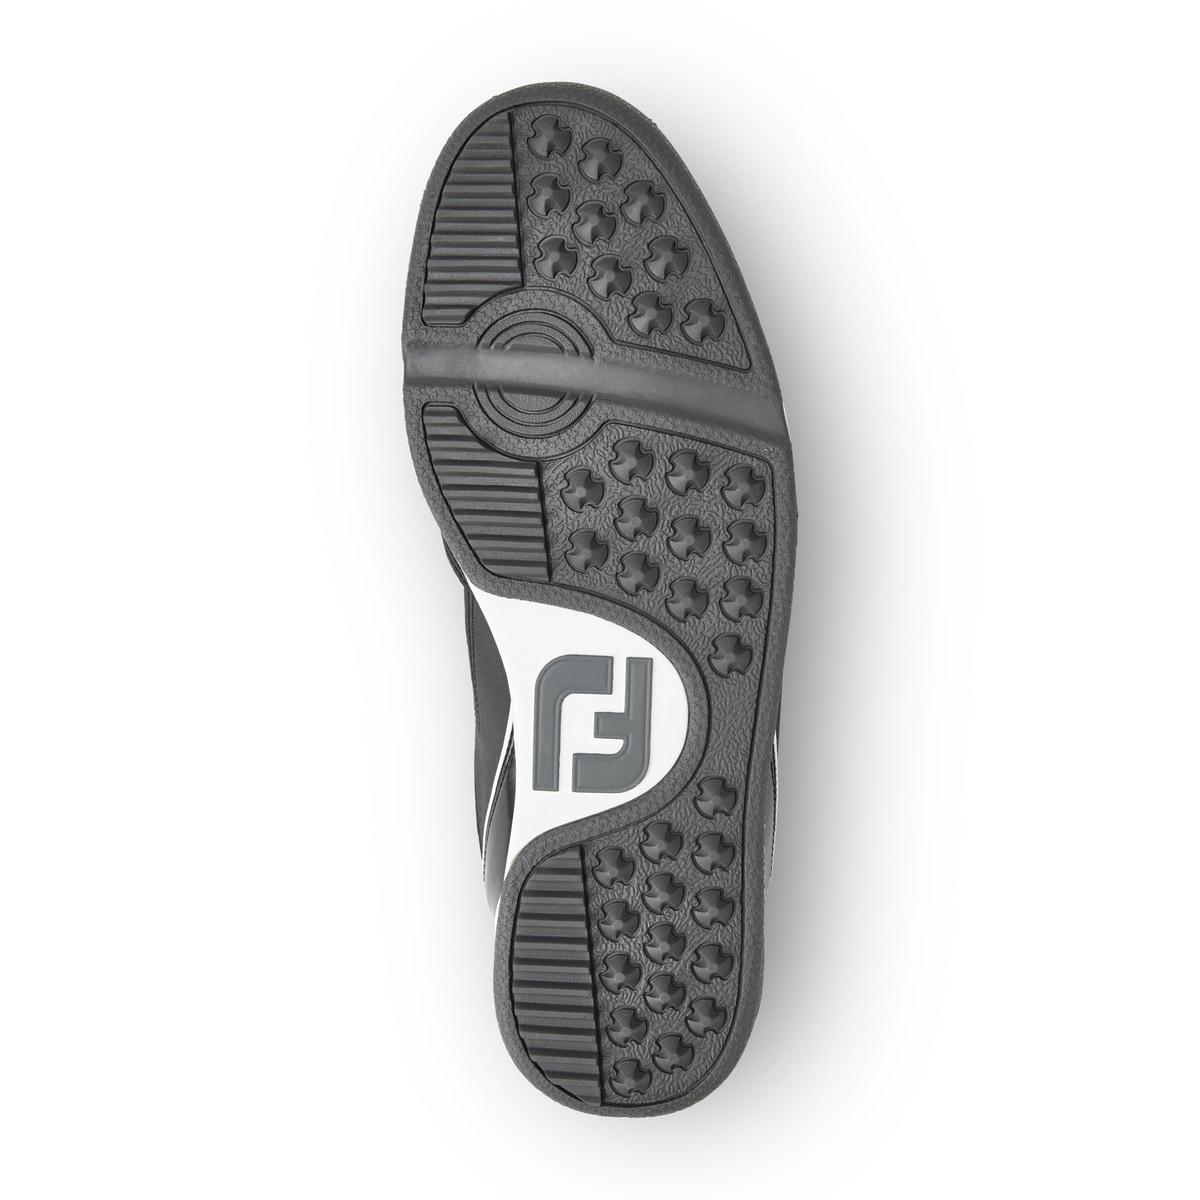 FJ Originals-Vorjahresmodell